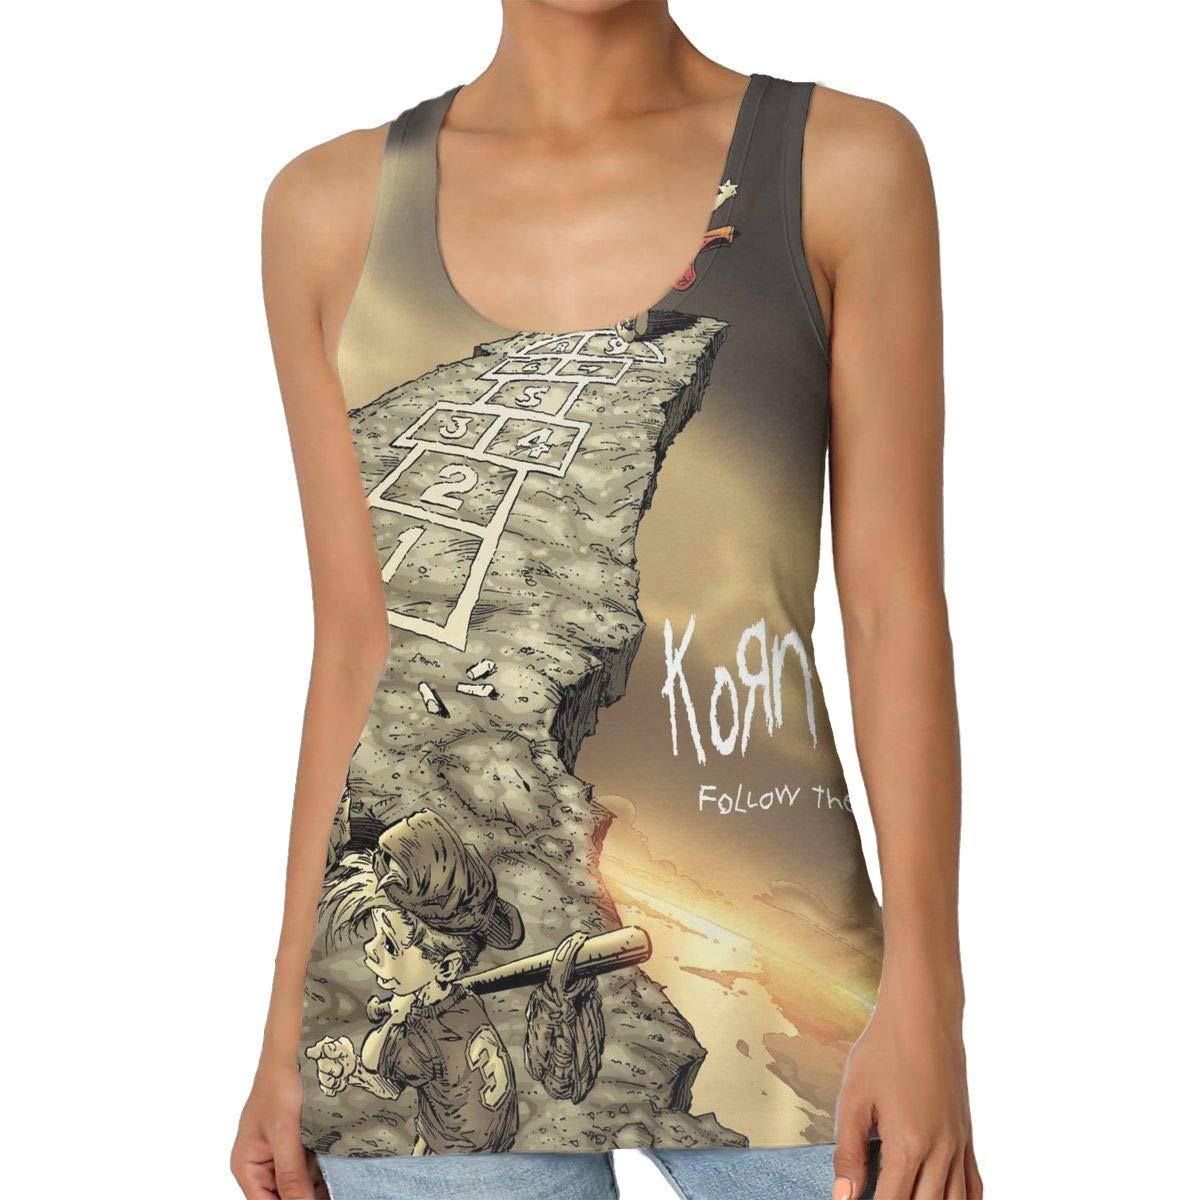 ByronJRivera Korn Follow The Leader Womens Sexy Tank Breathable rnTops Vest T-Shirt